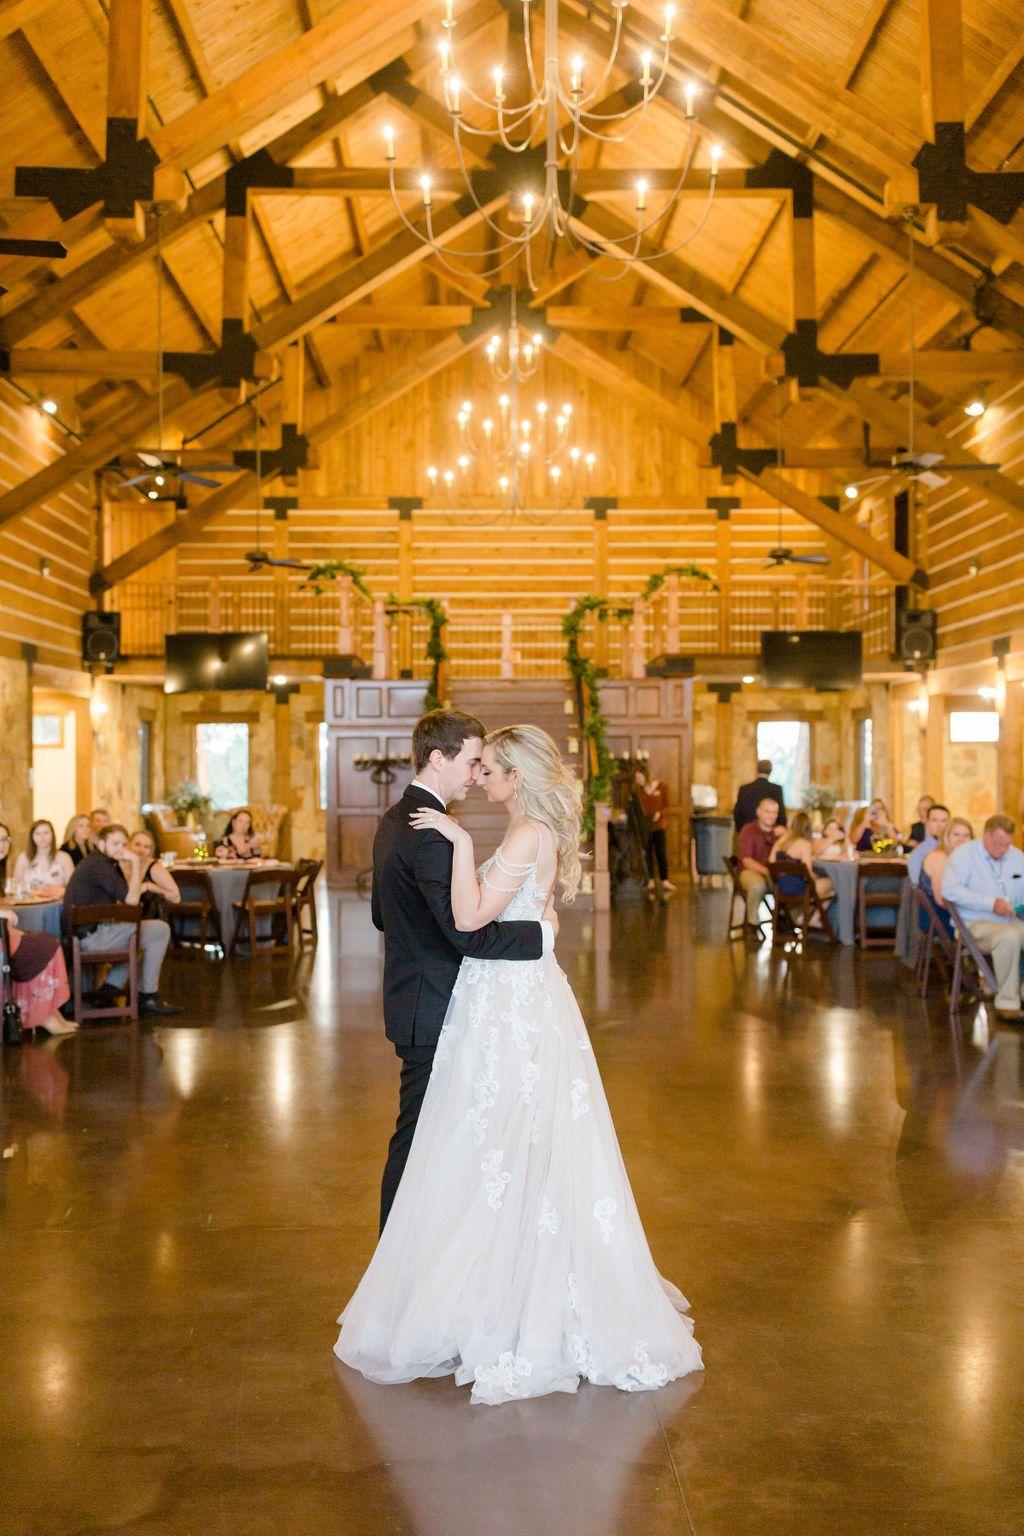 Lodge Wedding Venue in Denton Texas in 2020 Barn wedding